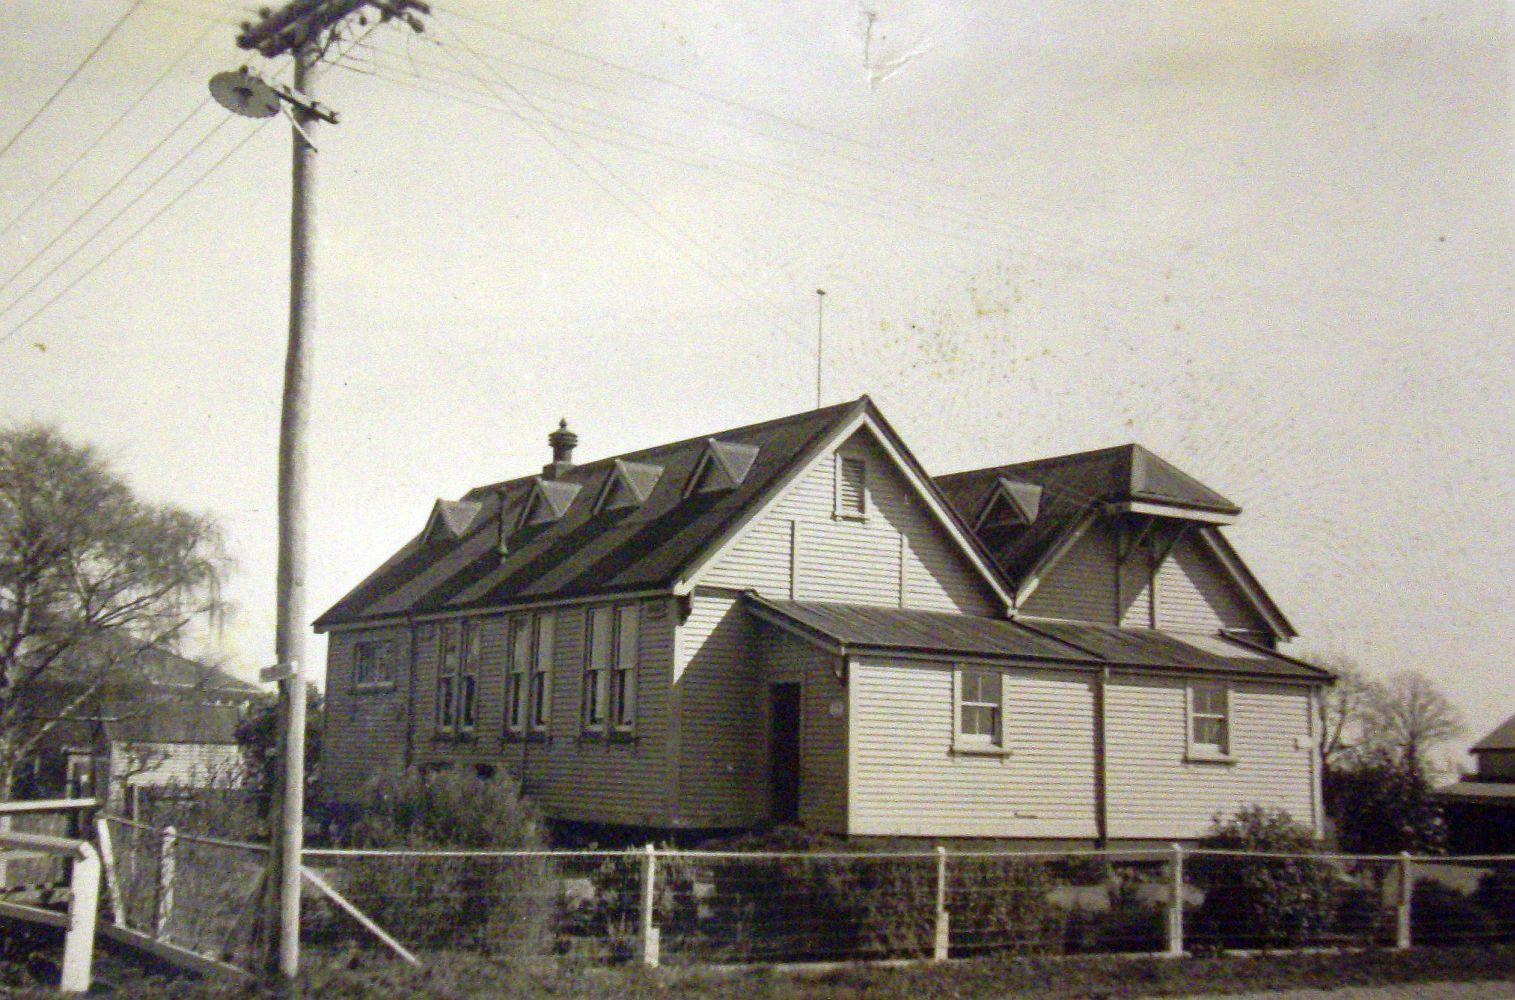 Marshland  school, taken from the corner of Prestons and Marshland roads